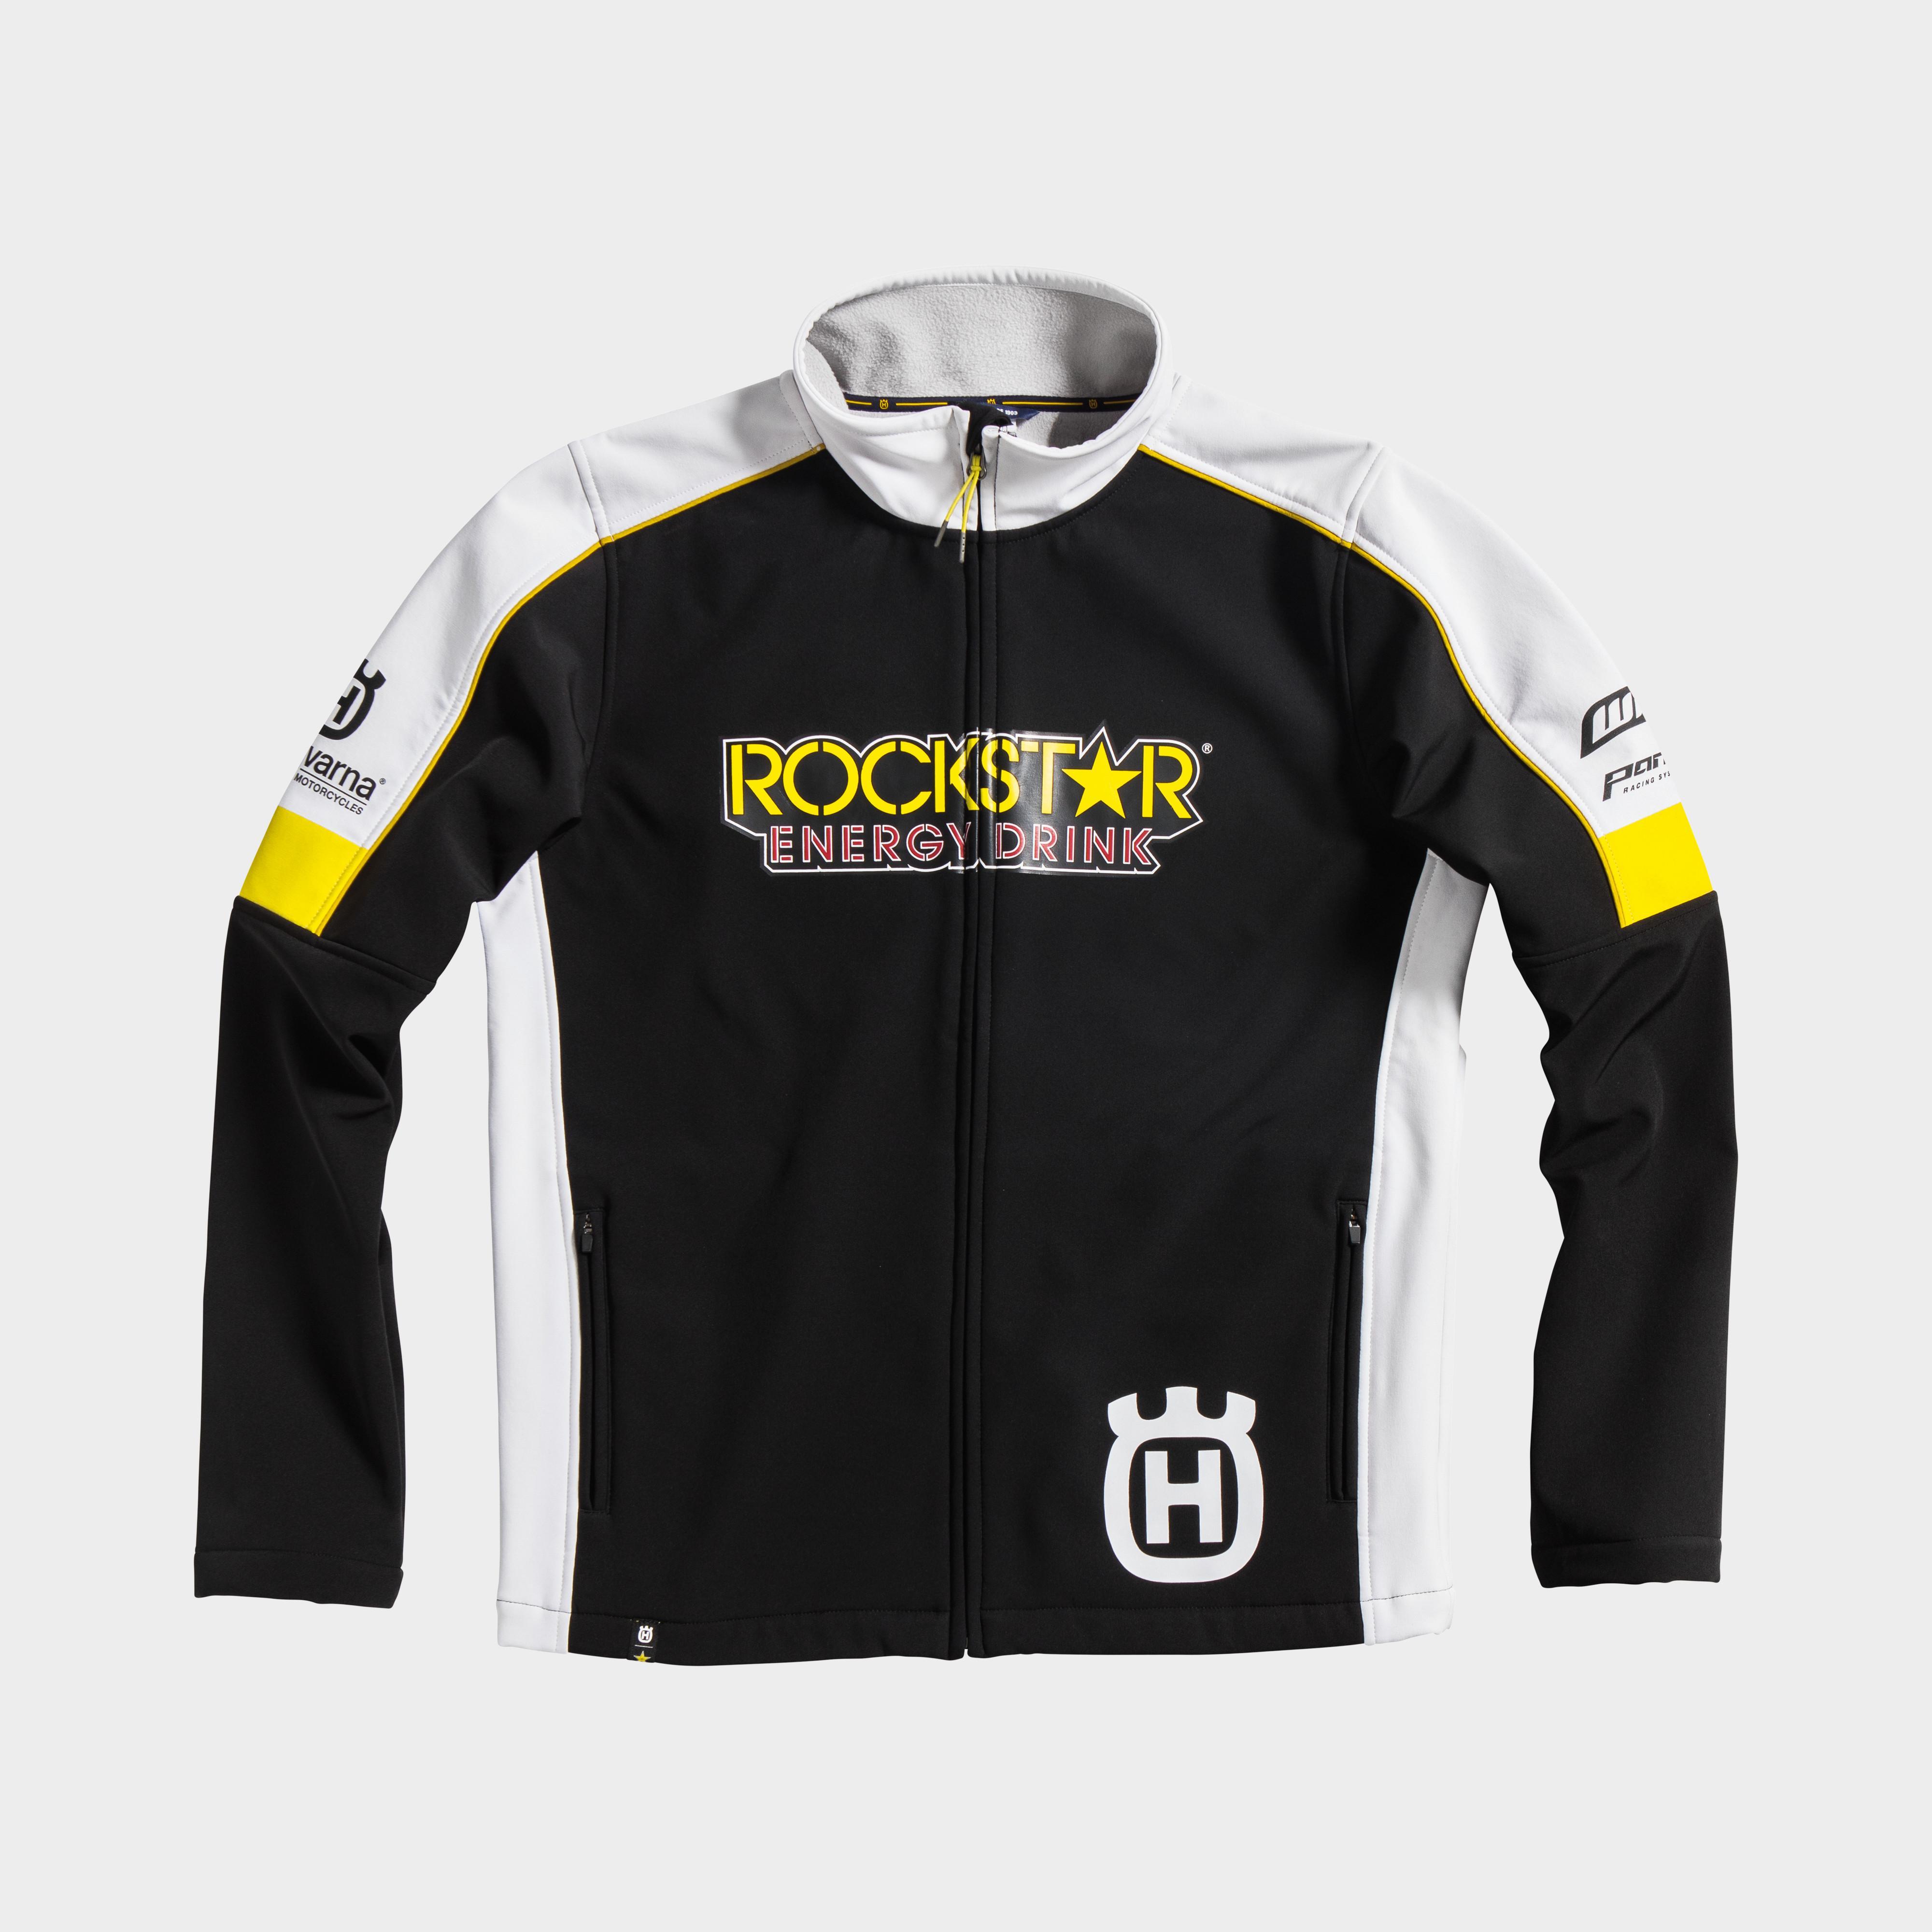 rockstar energy husqvarna factory racing replica collection team jacket